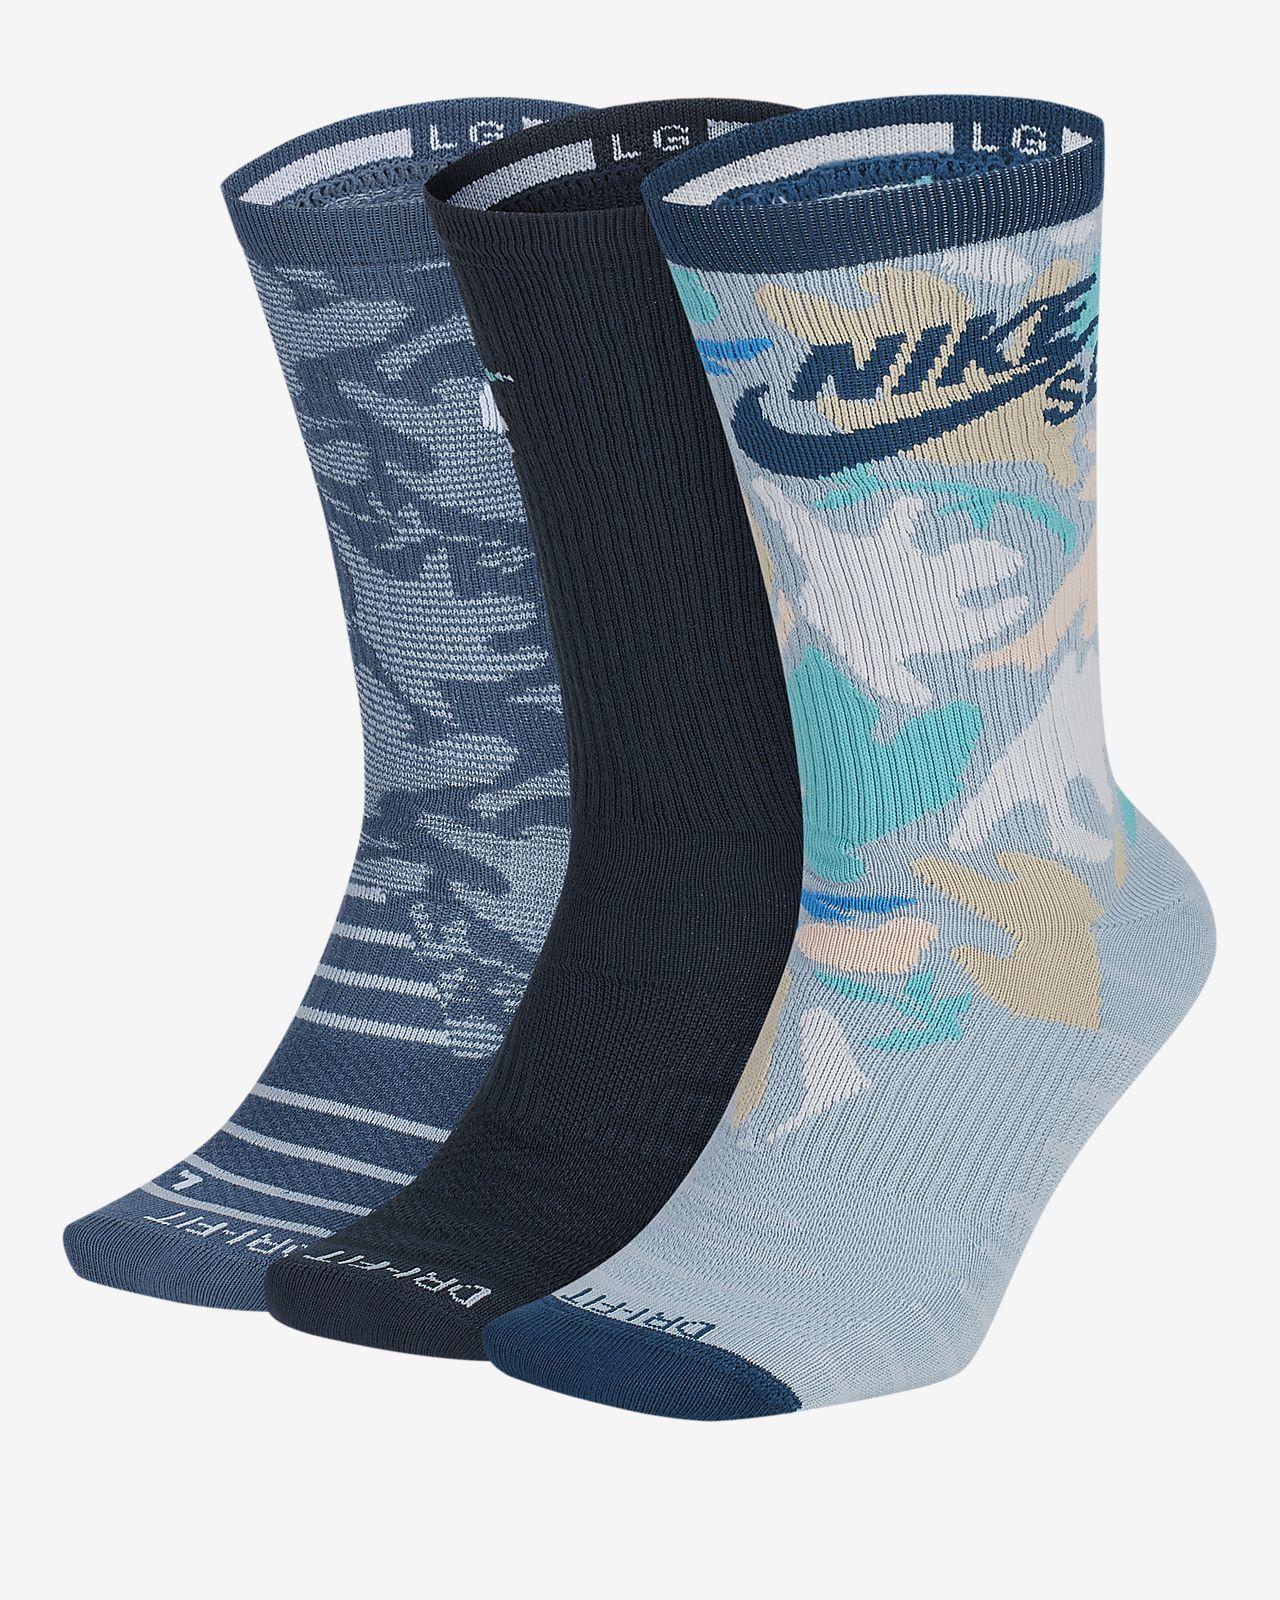 Nike SB Everyday Max Lightweight Calcetines largos de skateboard (3 pares)